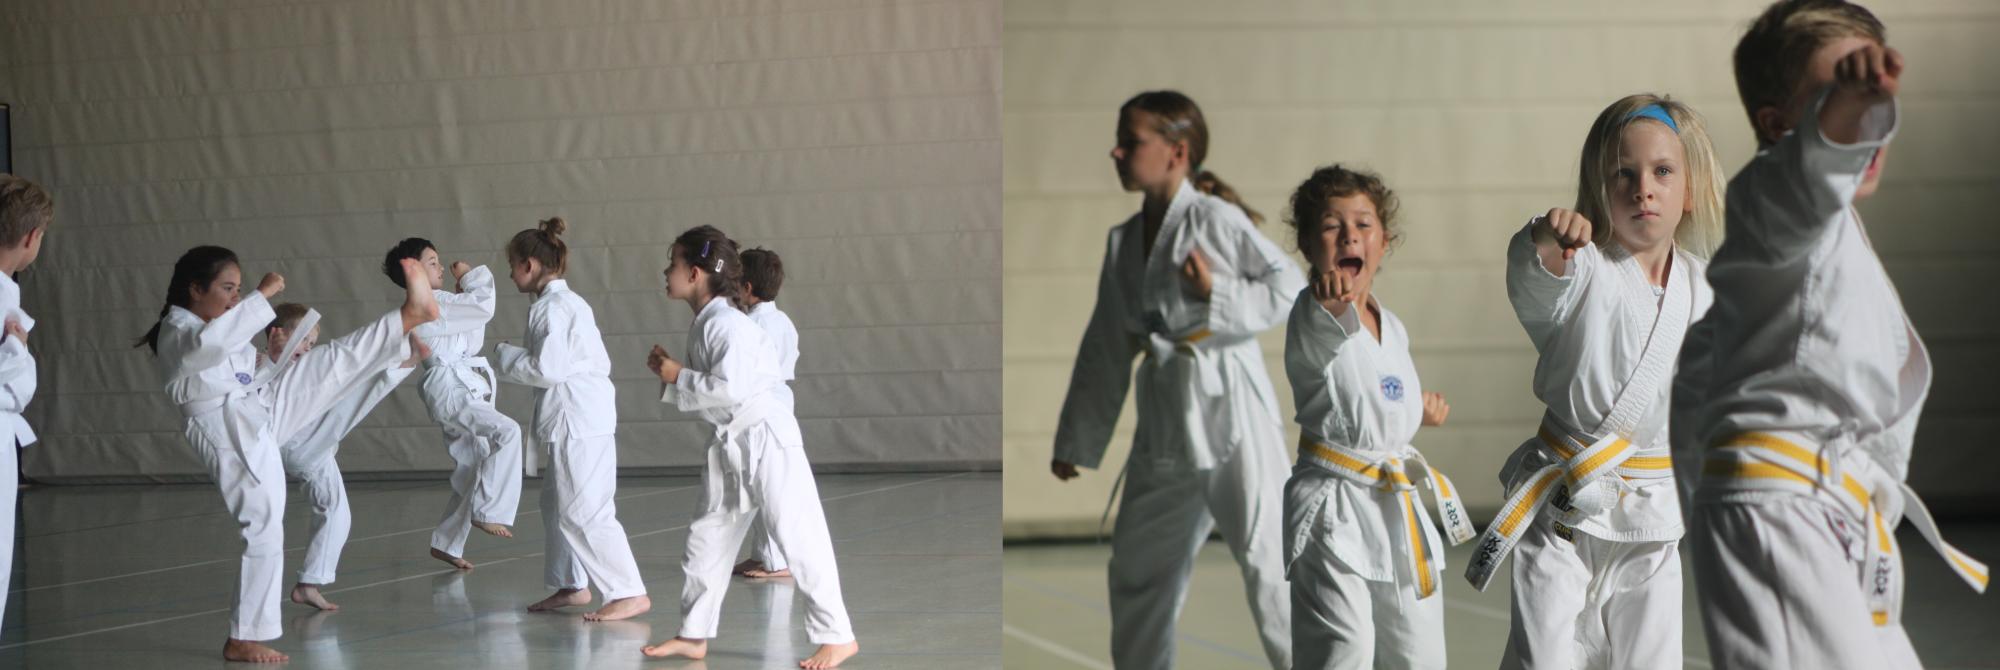 Klassisches Taekwondo Olching 0179-7693386